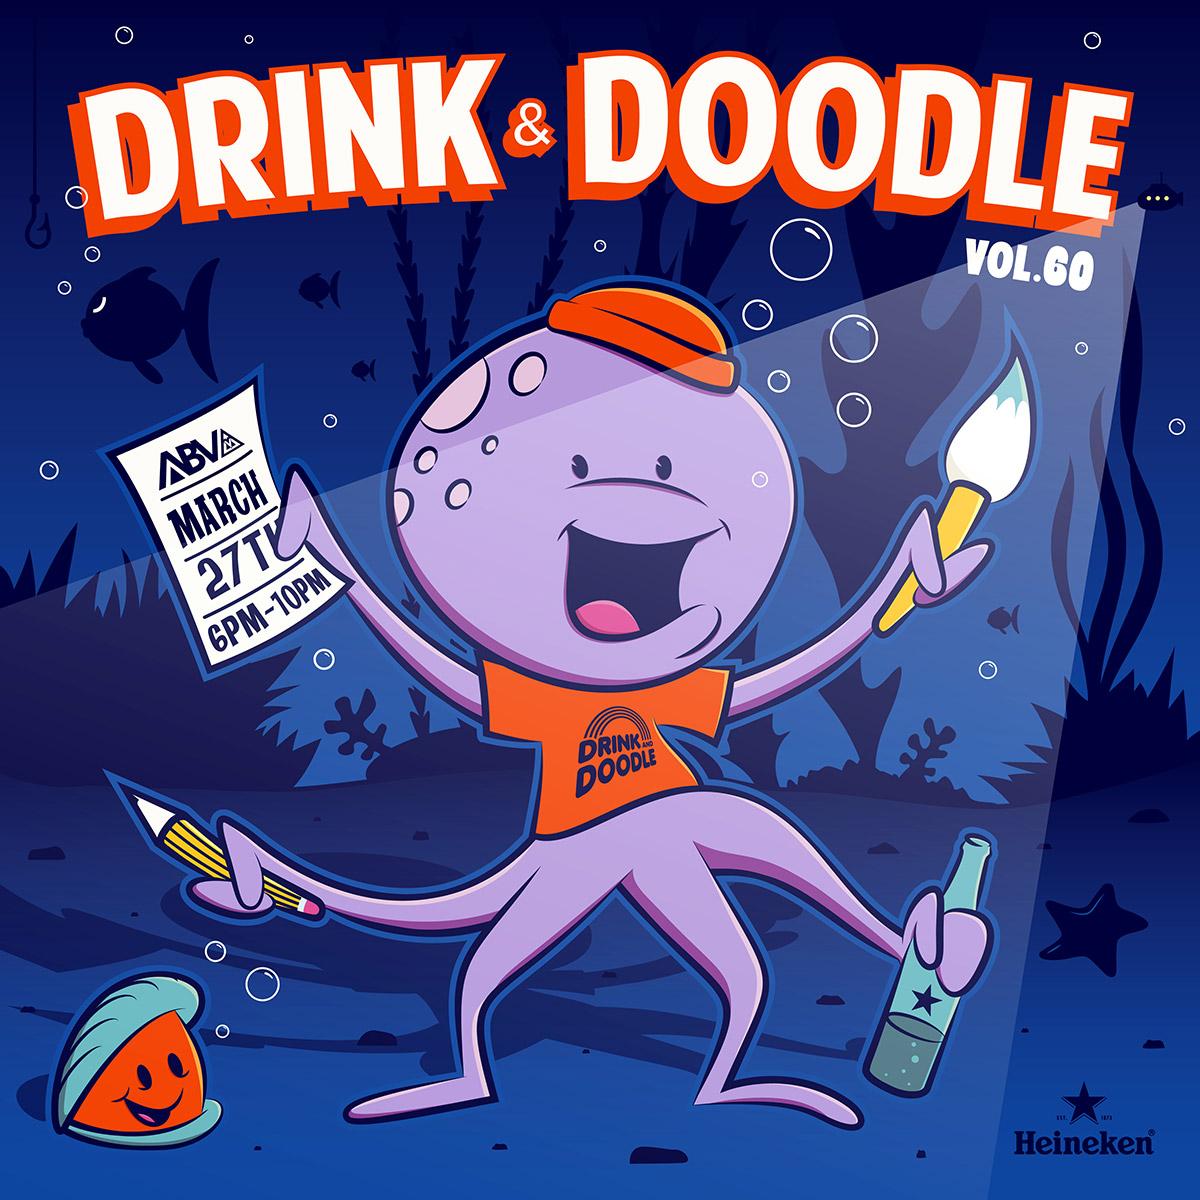 drink_doodle_59-web.jpg